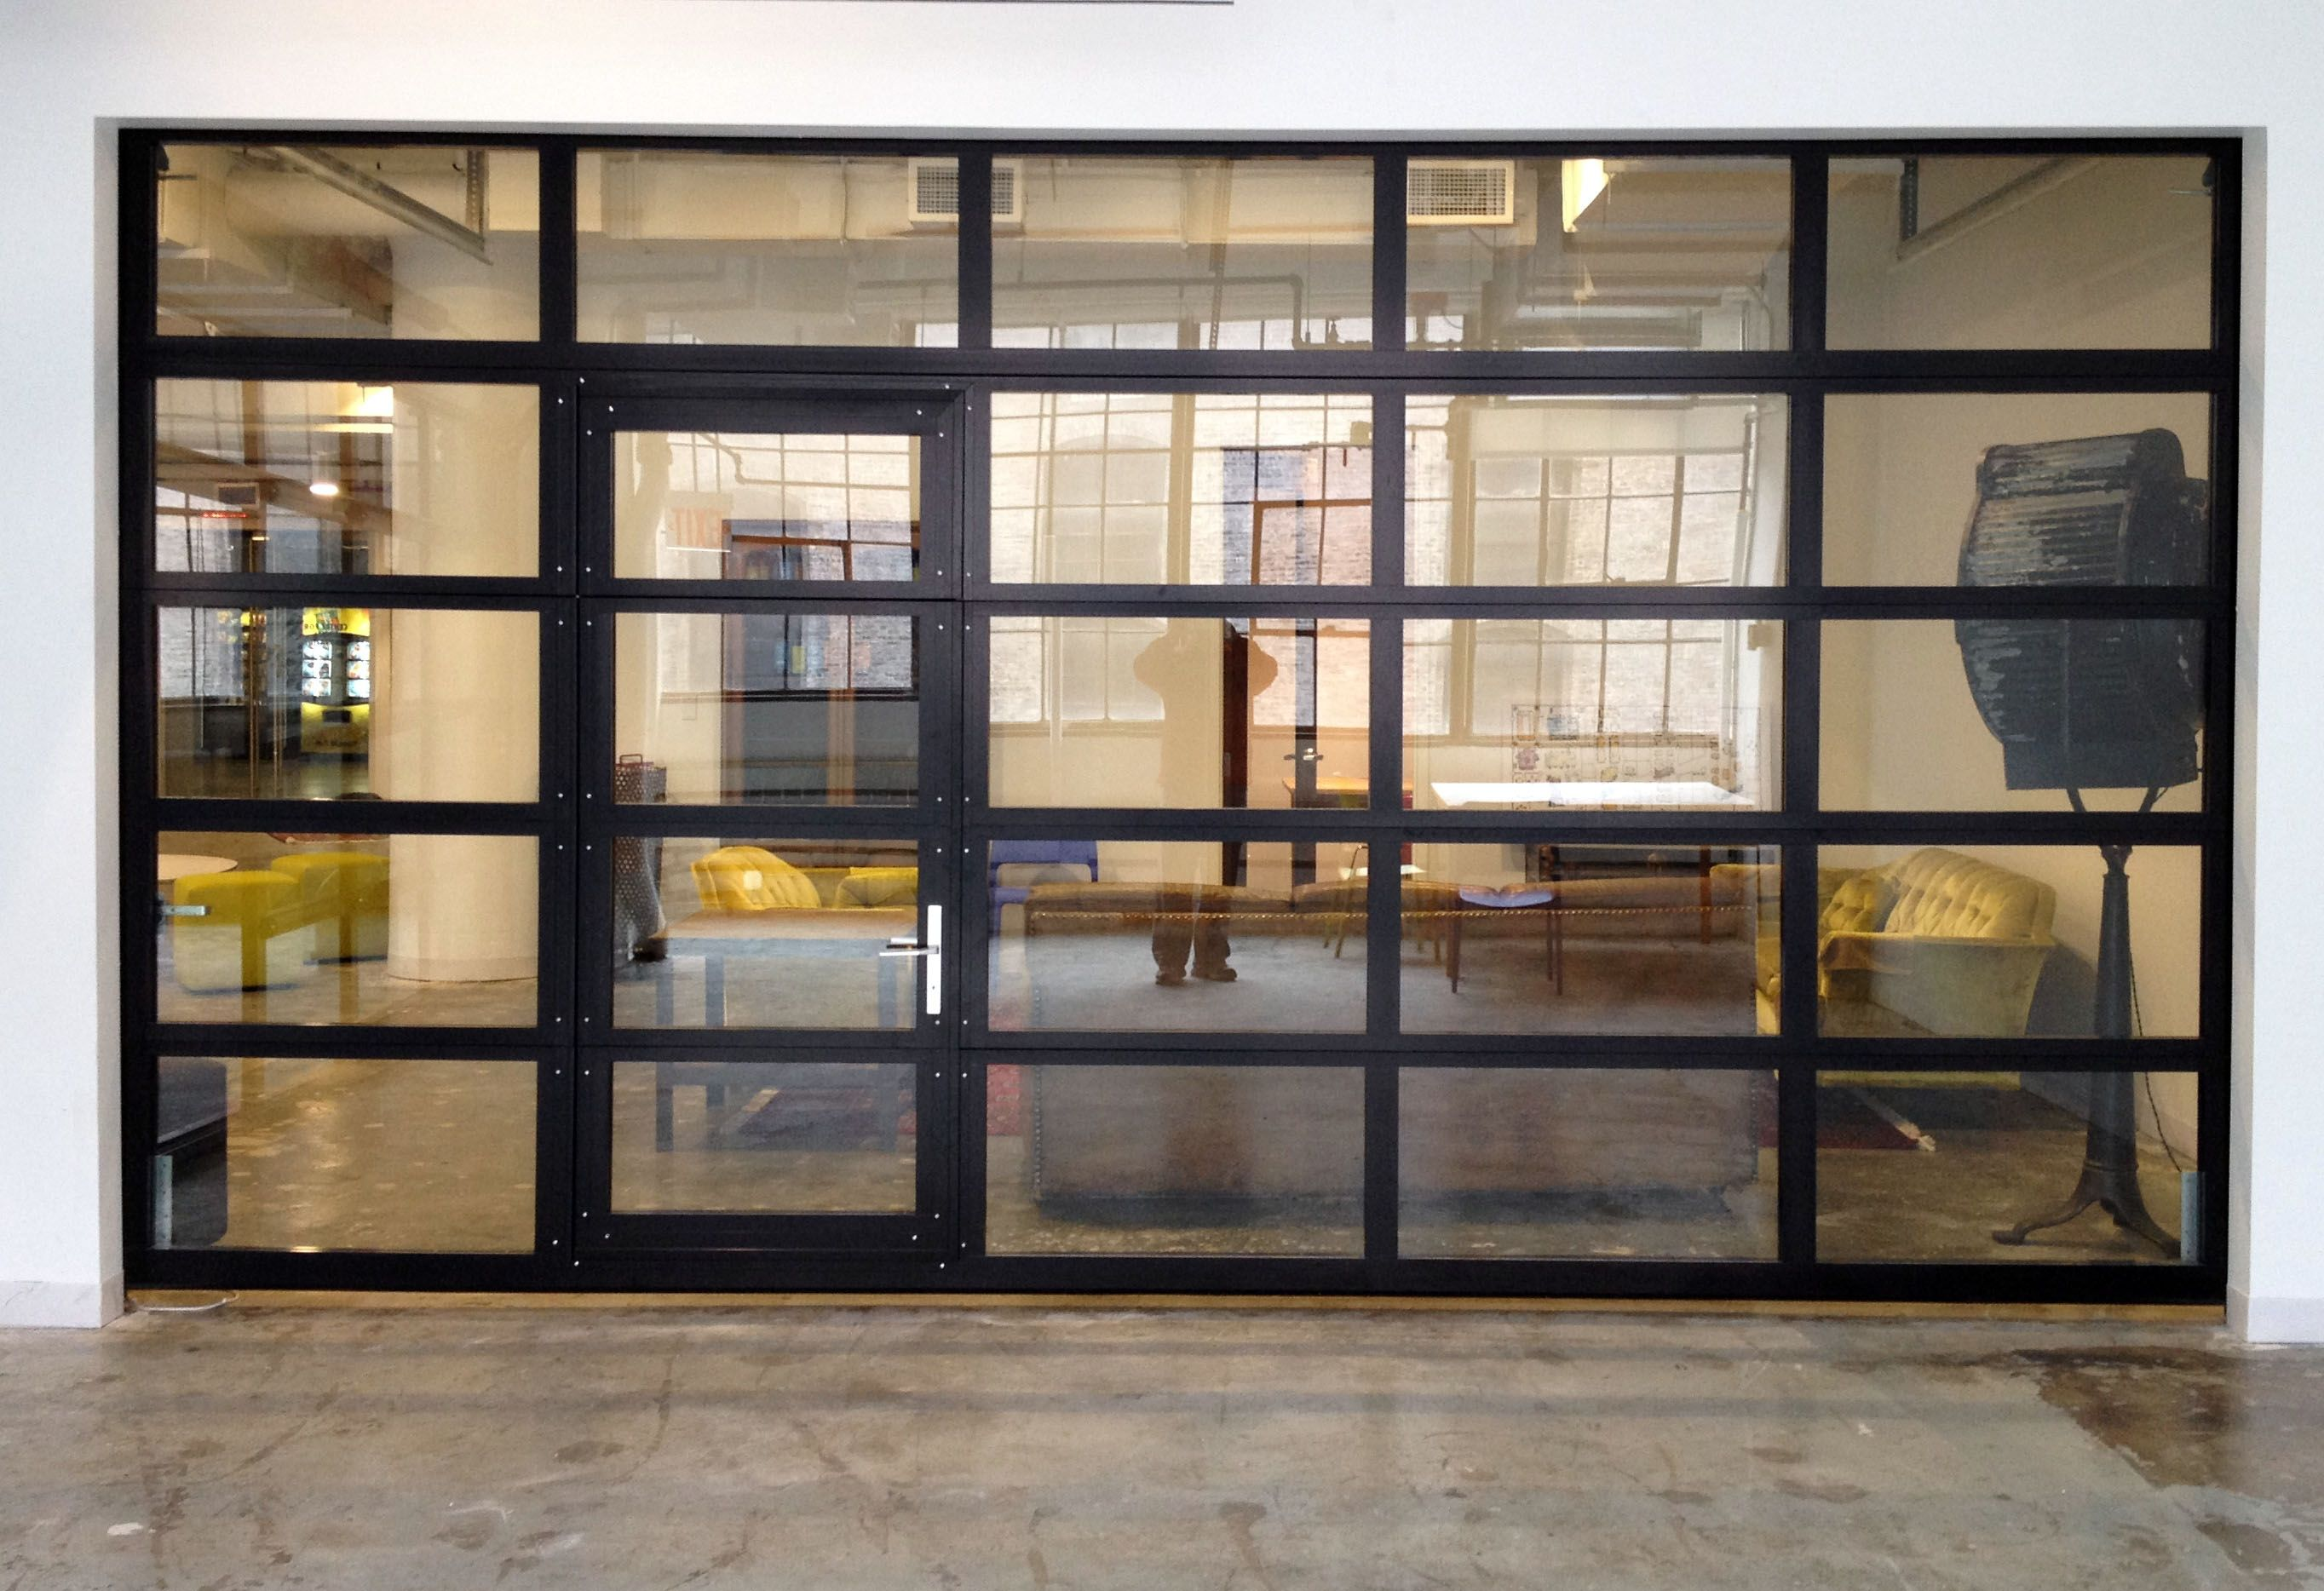 inserts glass best full ideas designs windowage overhead cost magnetic door of garage size beautiful doors panels window modern pictures panel